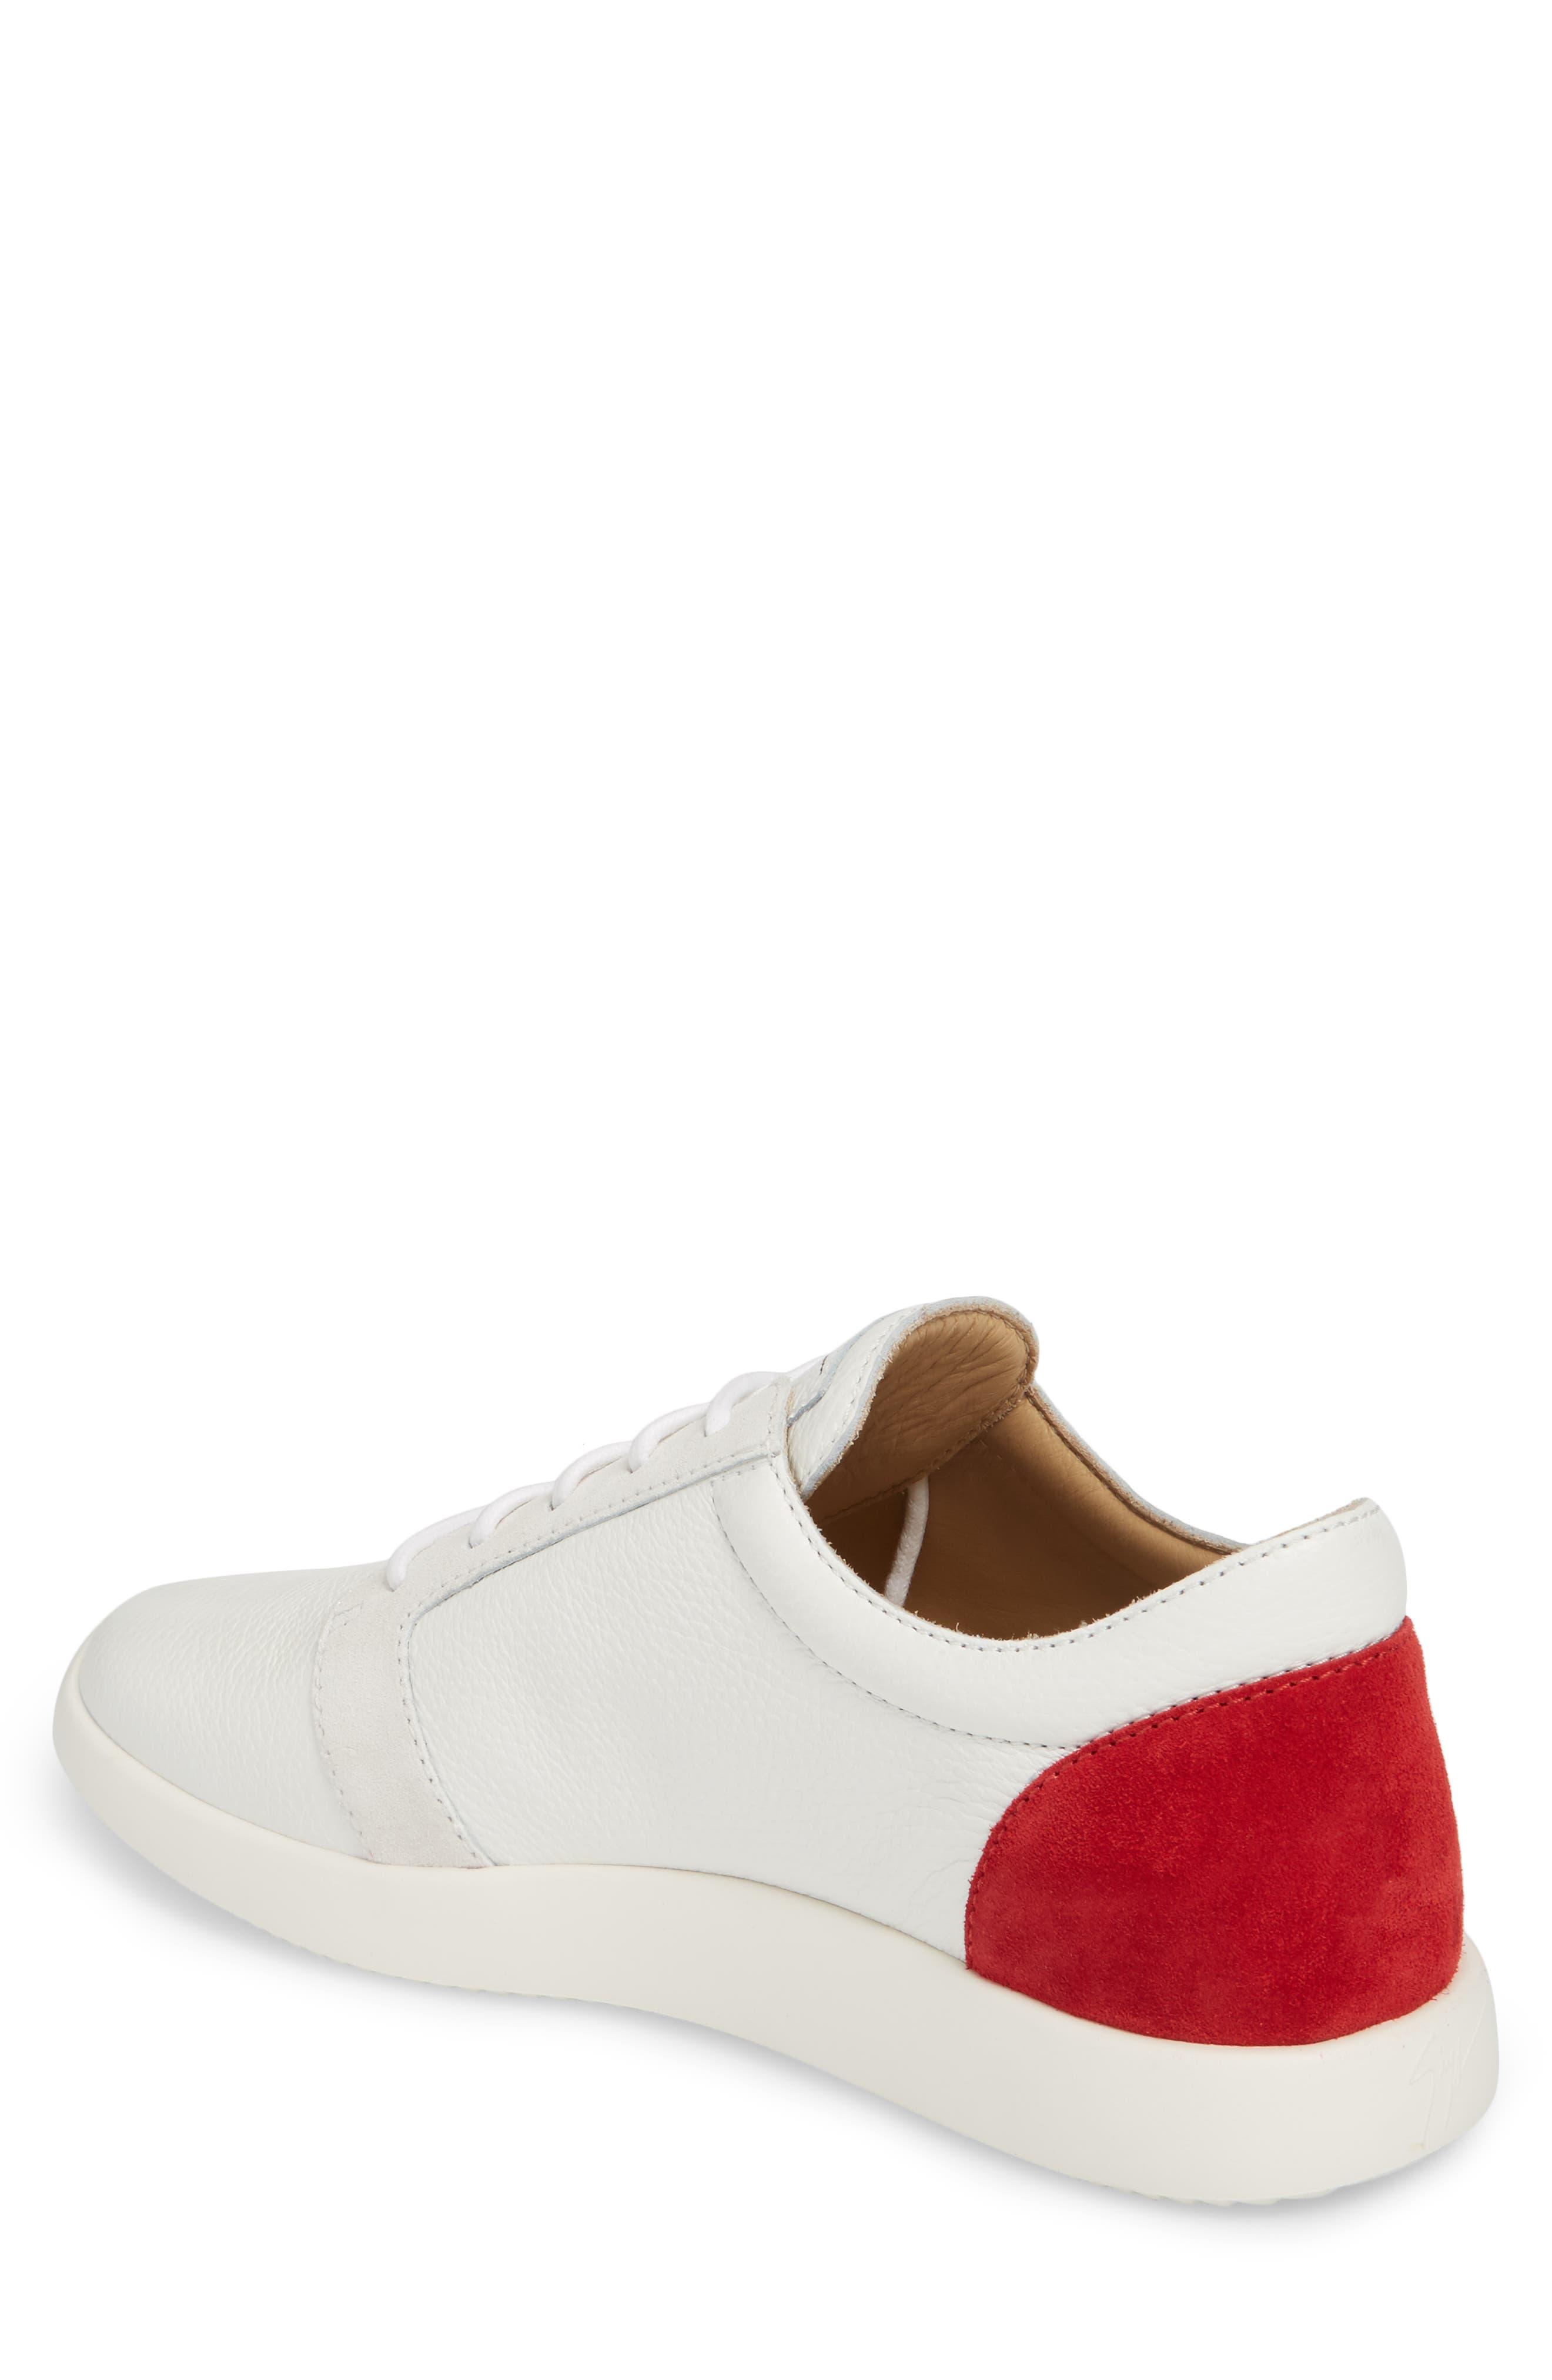 Signature Sneaker,                             Alternate thumbnail 2, color,                             124